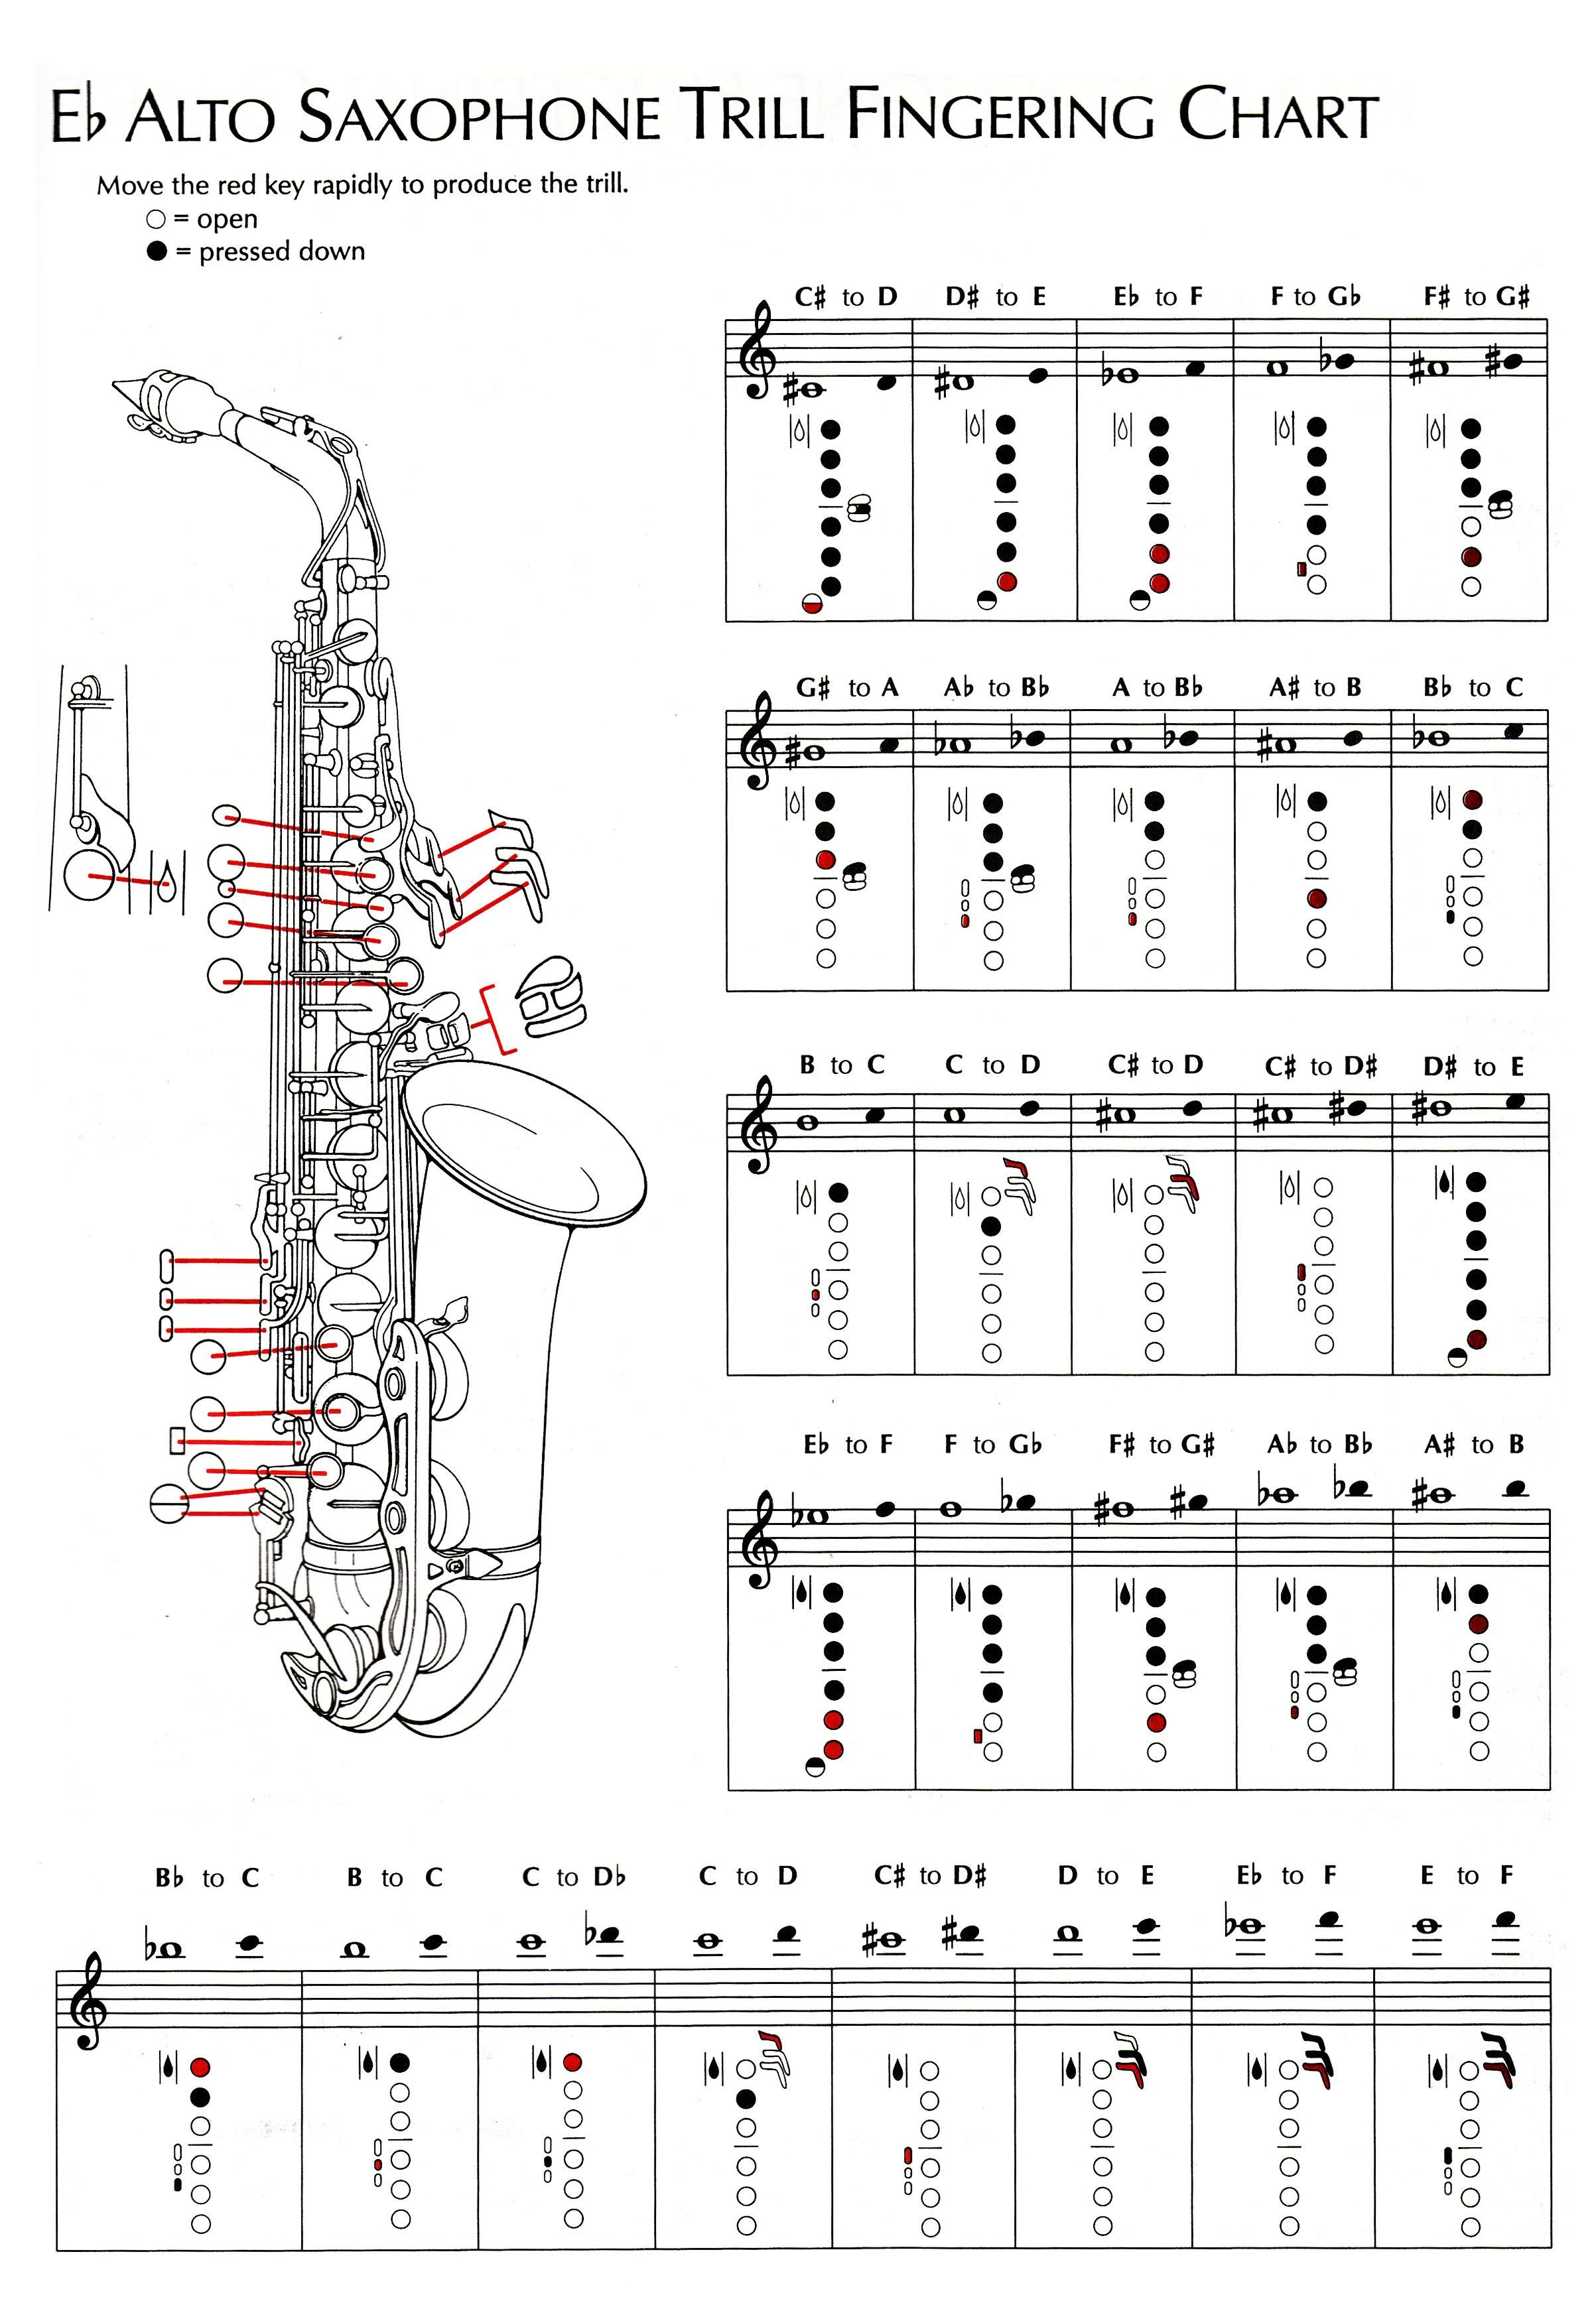 Alto Saxophone Parts Diagram Alto Saxophone Keys Chart Instrument Fingering B Charts B